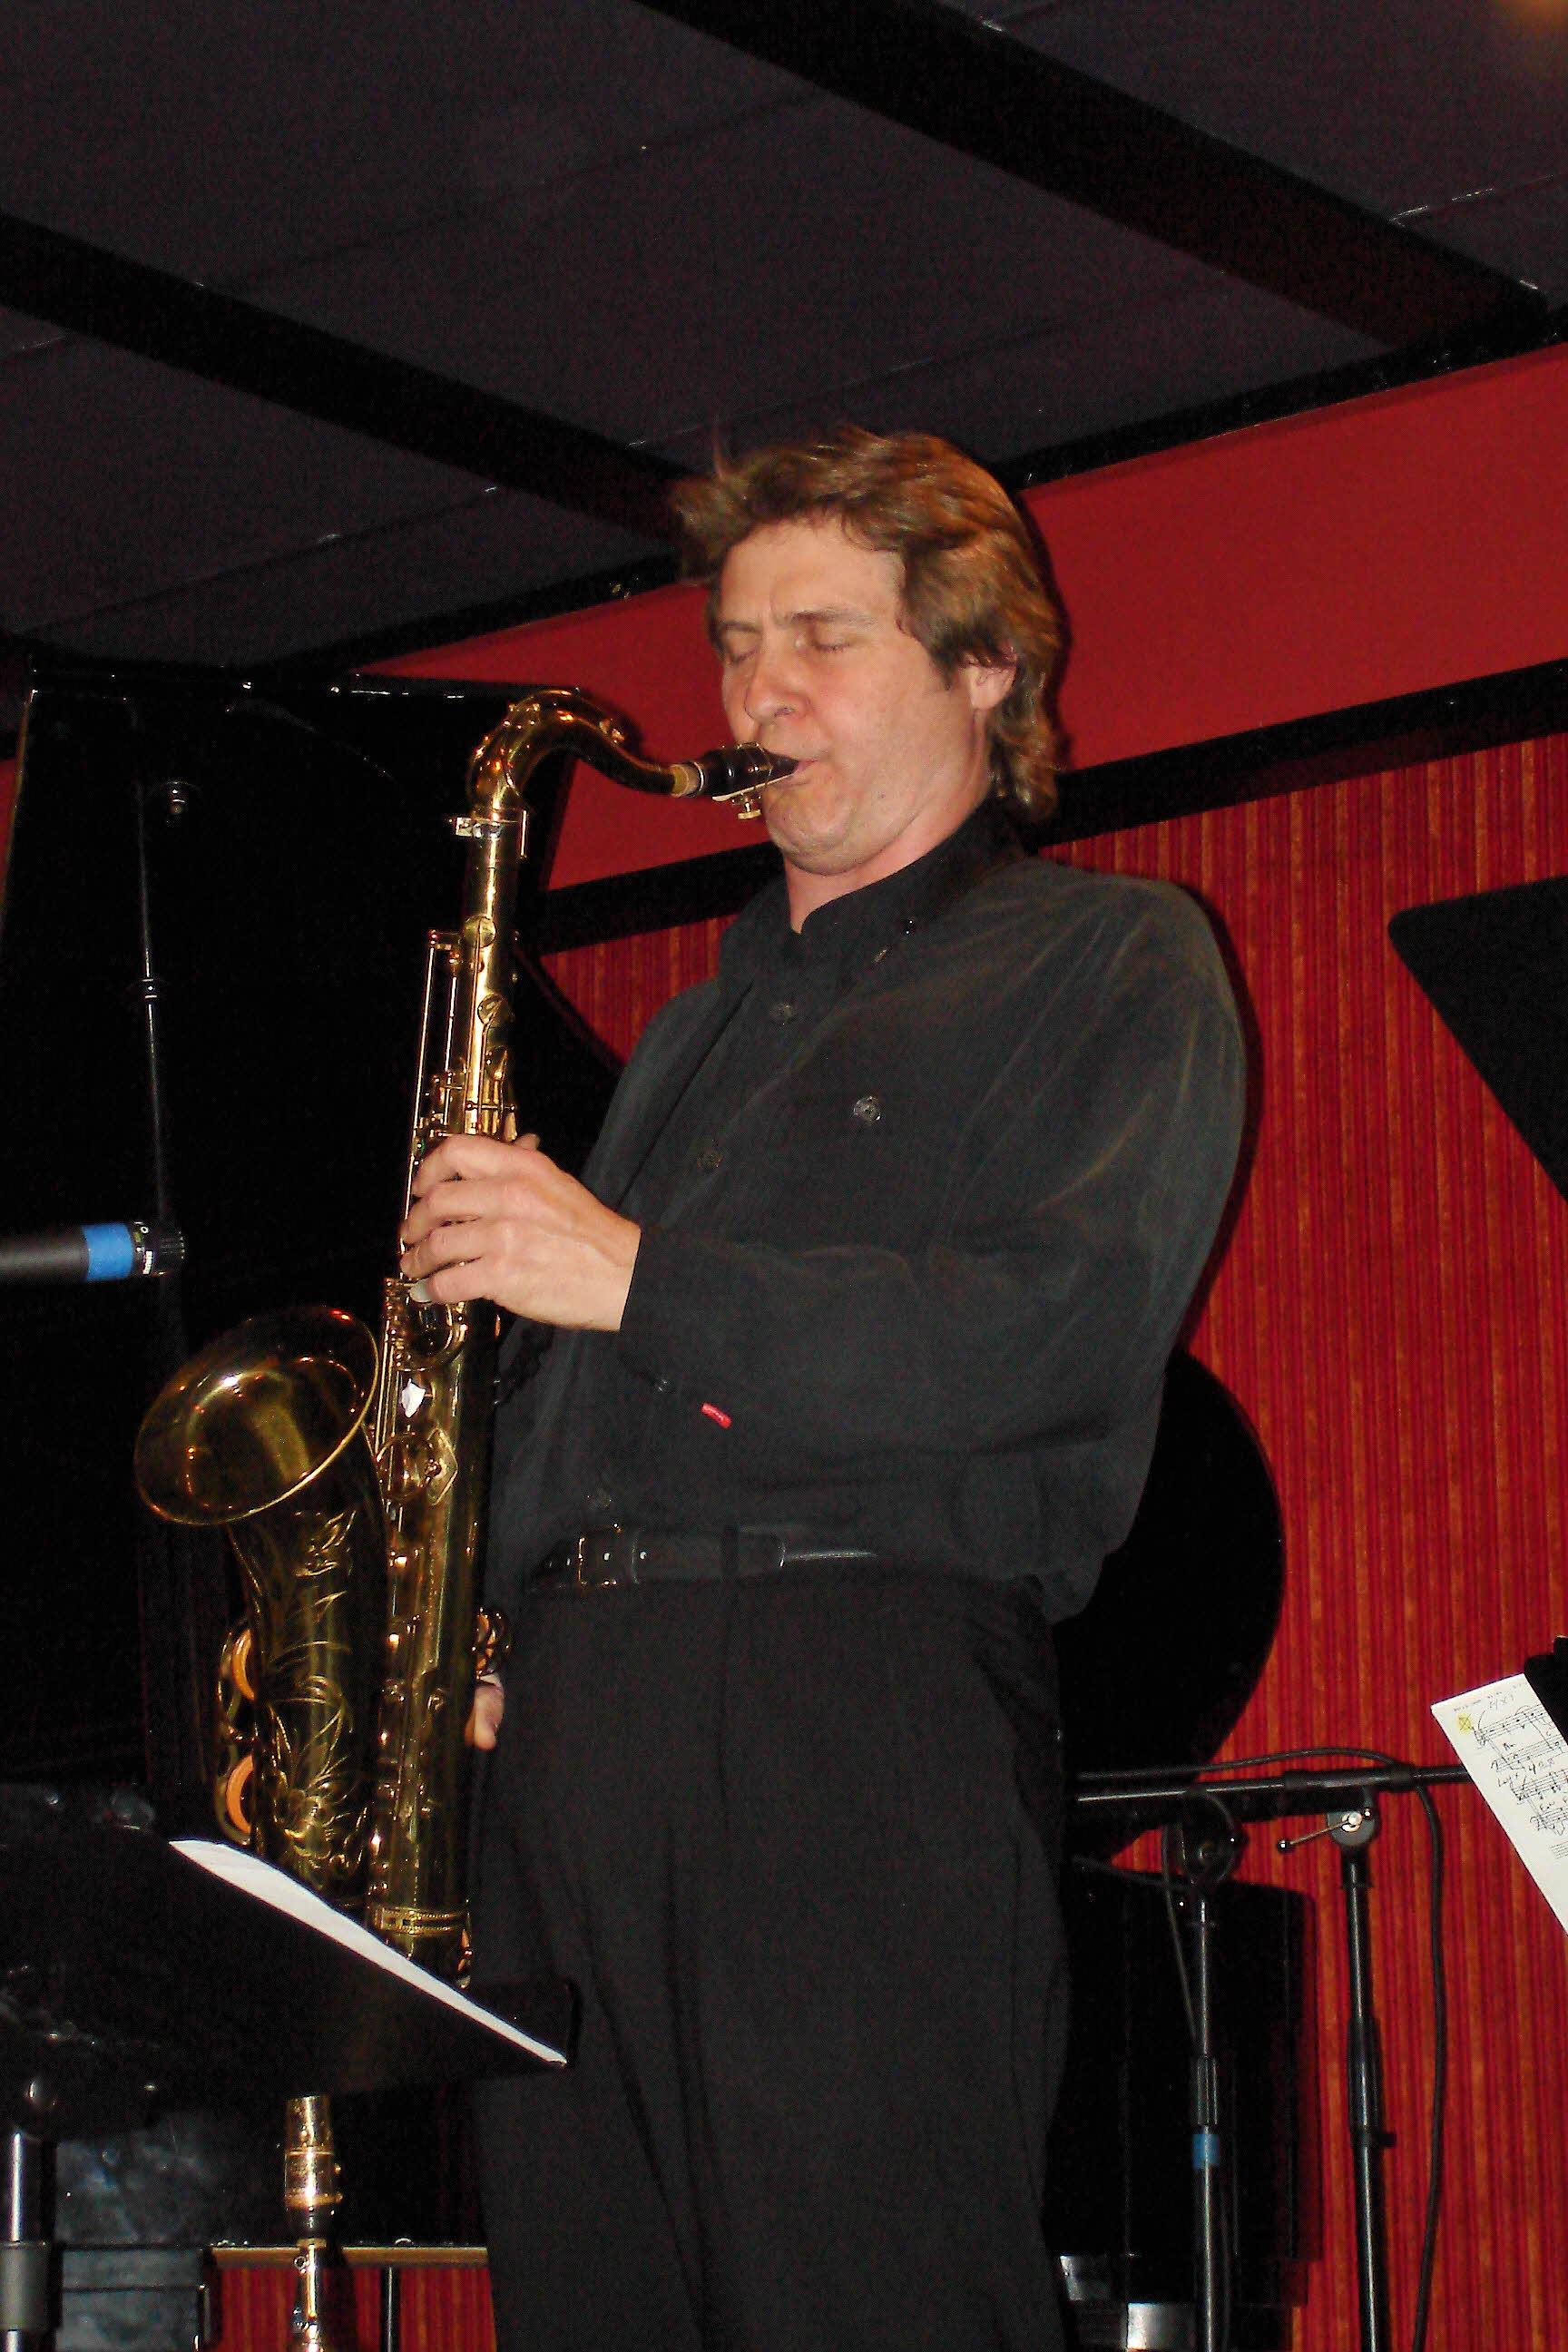 Tim Ries